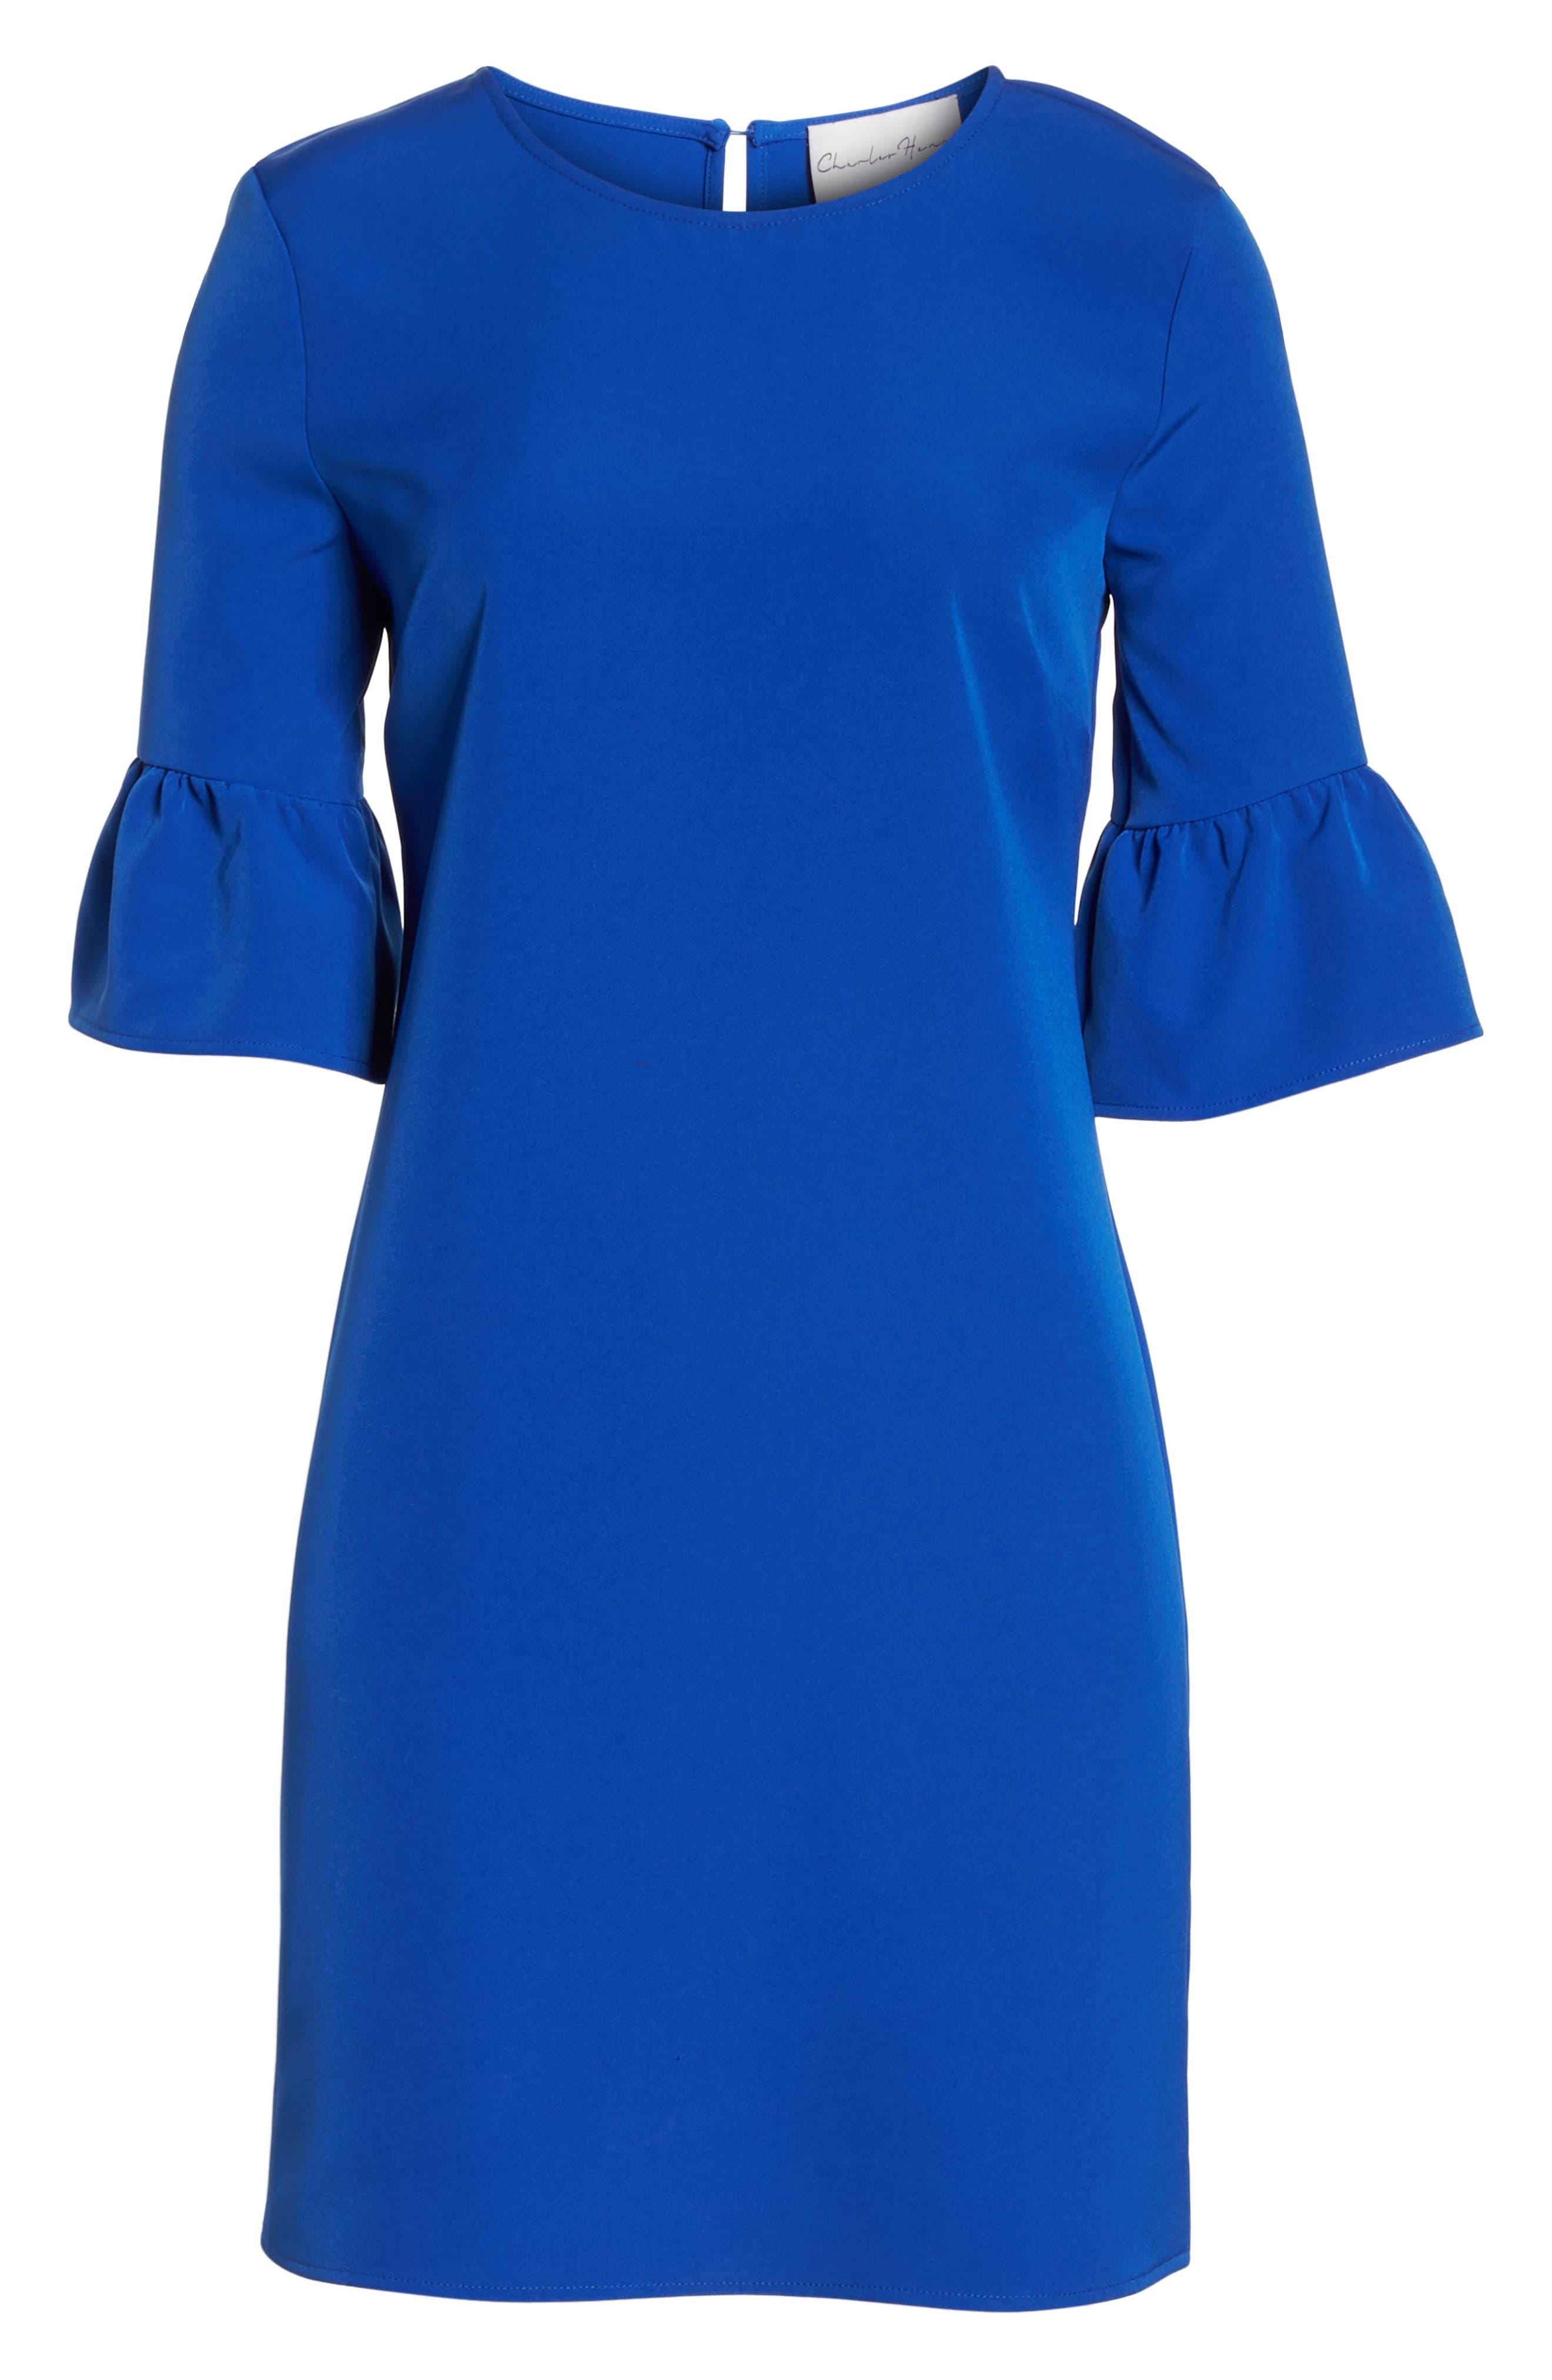 Bell Sleeve Shift Dress,                             Alternate thumbnail 7, color,                             Patriot Blue